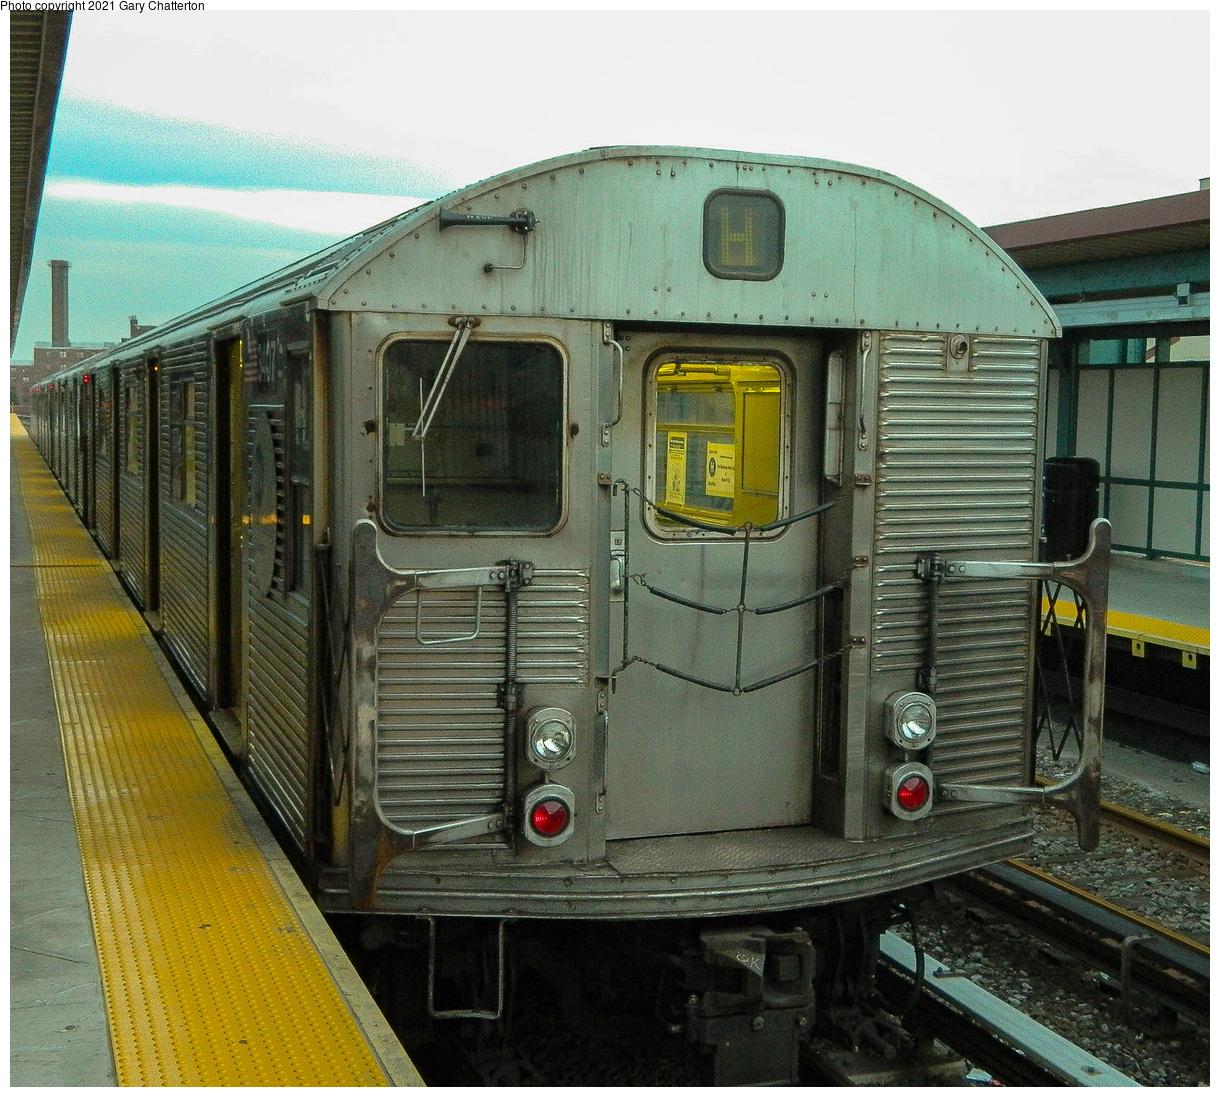 (663k, 1220x1097)<br><b>Country:</b> United States<br><b>City:</b> New York<br><b>System:</b> New York City Transit<br><b>Line:</b> IND Rockaway Line<br><b>Location:</b> Beach 90th Street/Holland<br><b>Route:</b> H<br><b>Car:</b> R-32 (Budd, 1964) 3407 <br><b>Photo by:</b> Gary Chatterton<br><b>Date:</b> 12/12/2012<br><b>Notes:</b> H-Hurricane Sandy Shuttle<br><b>Viewed (this week/total):</b> 0 / 175